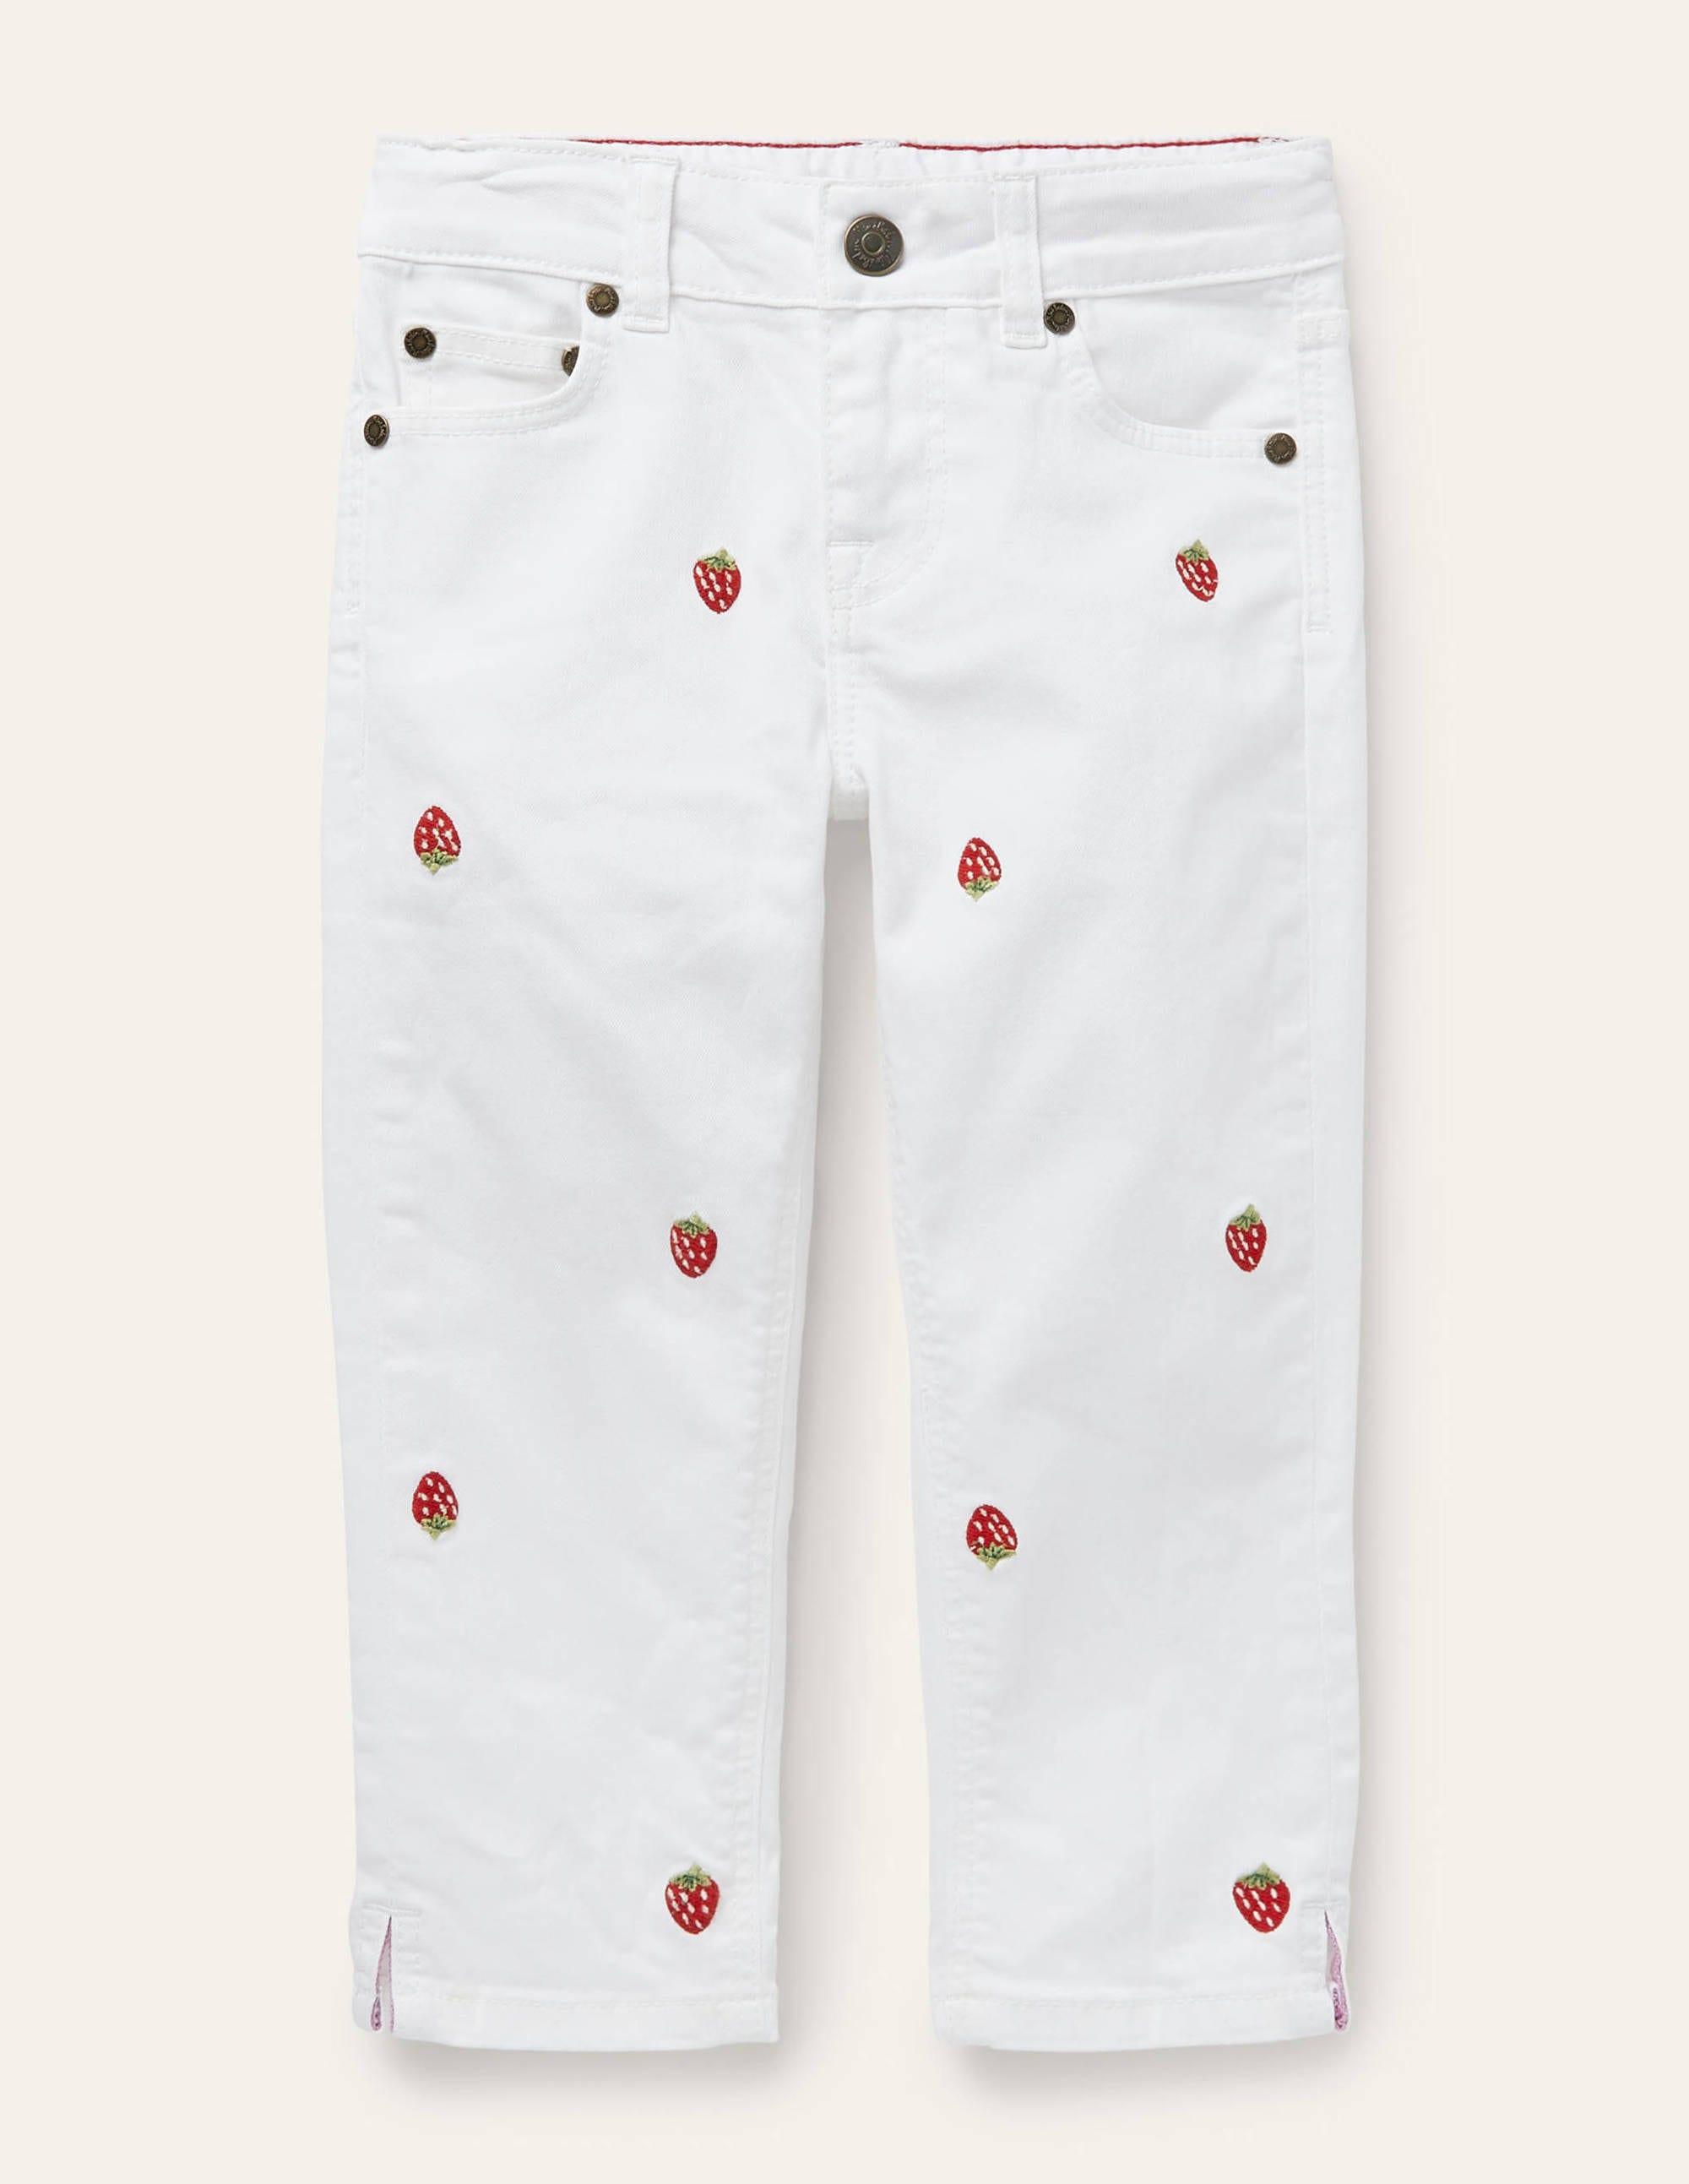 Boden Capri Pants - White Embroidered Strawberry